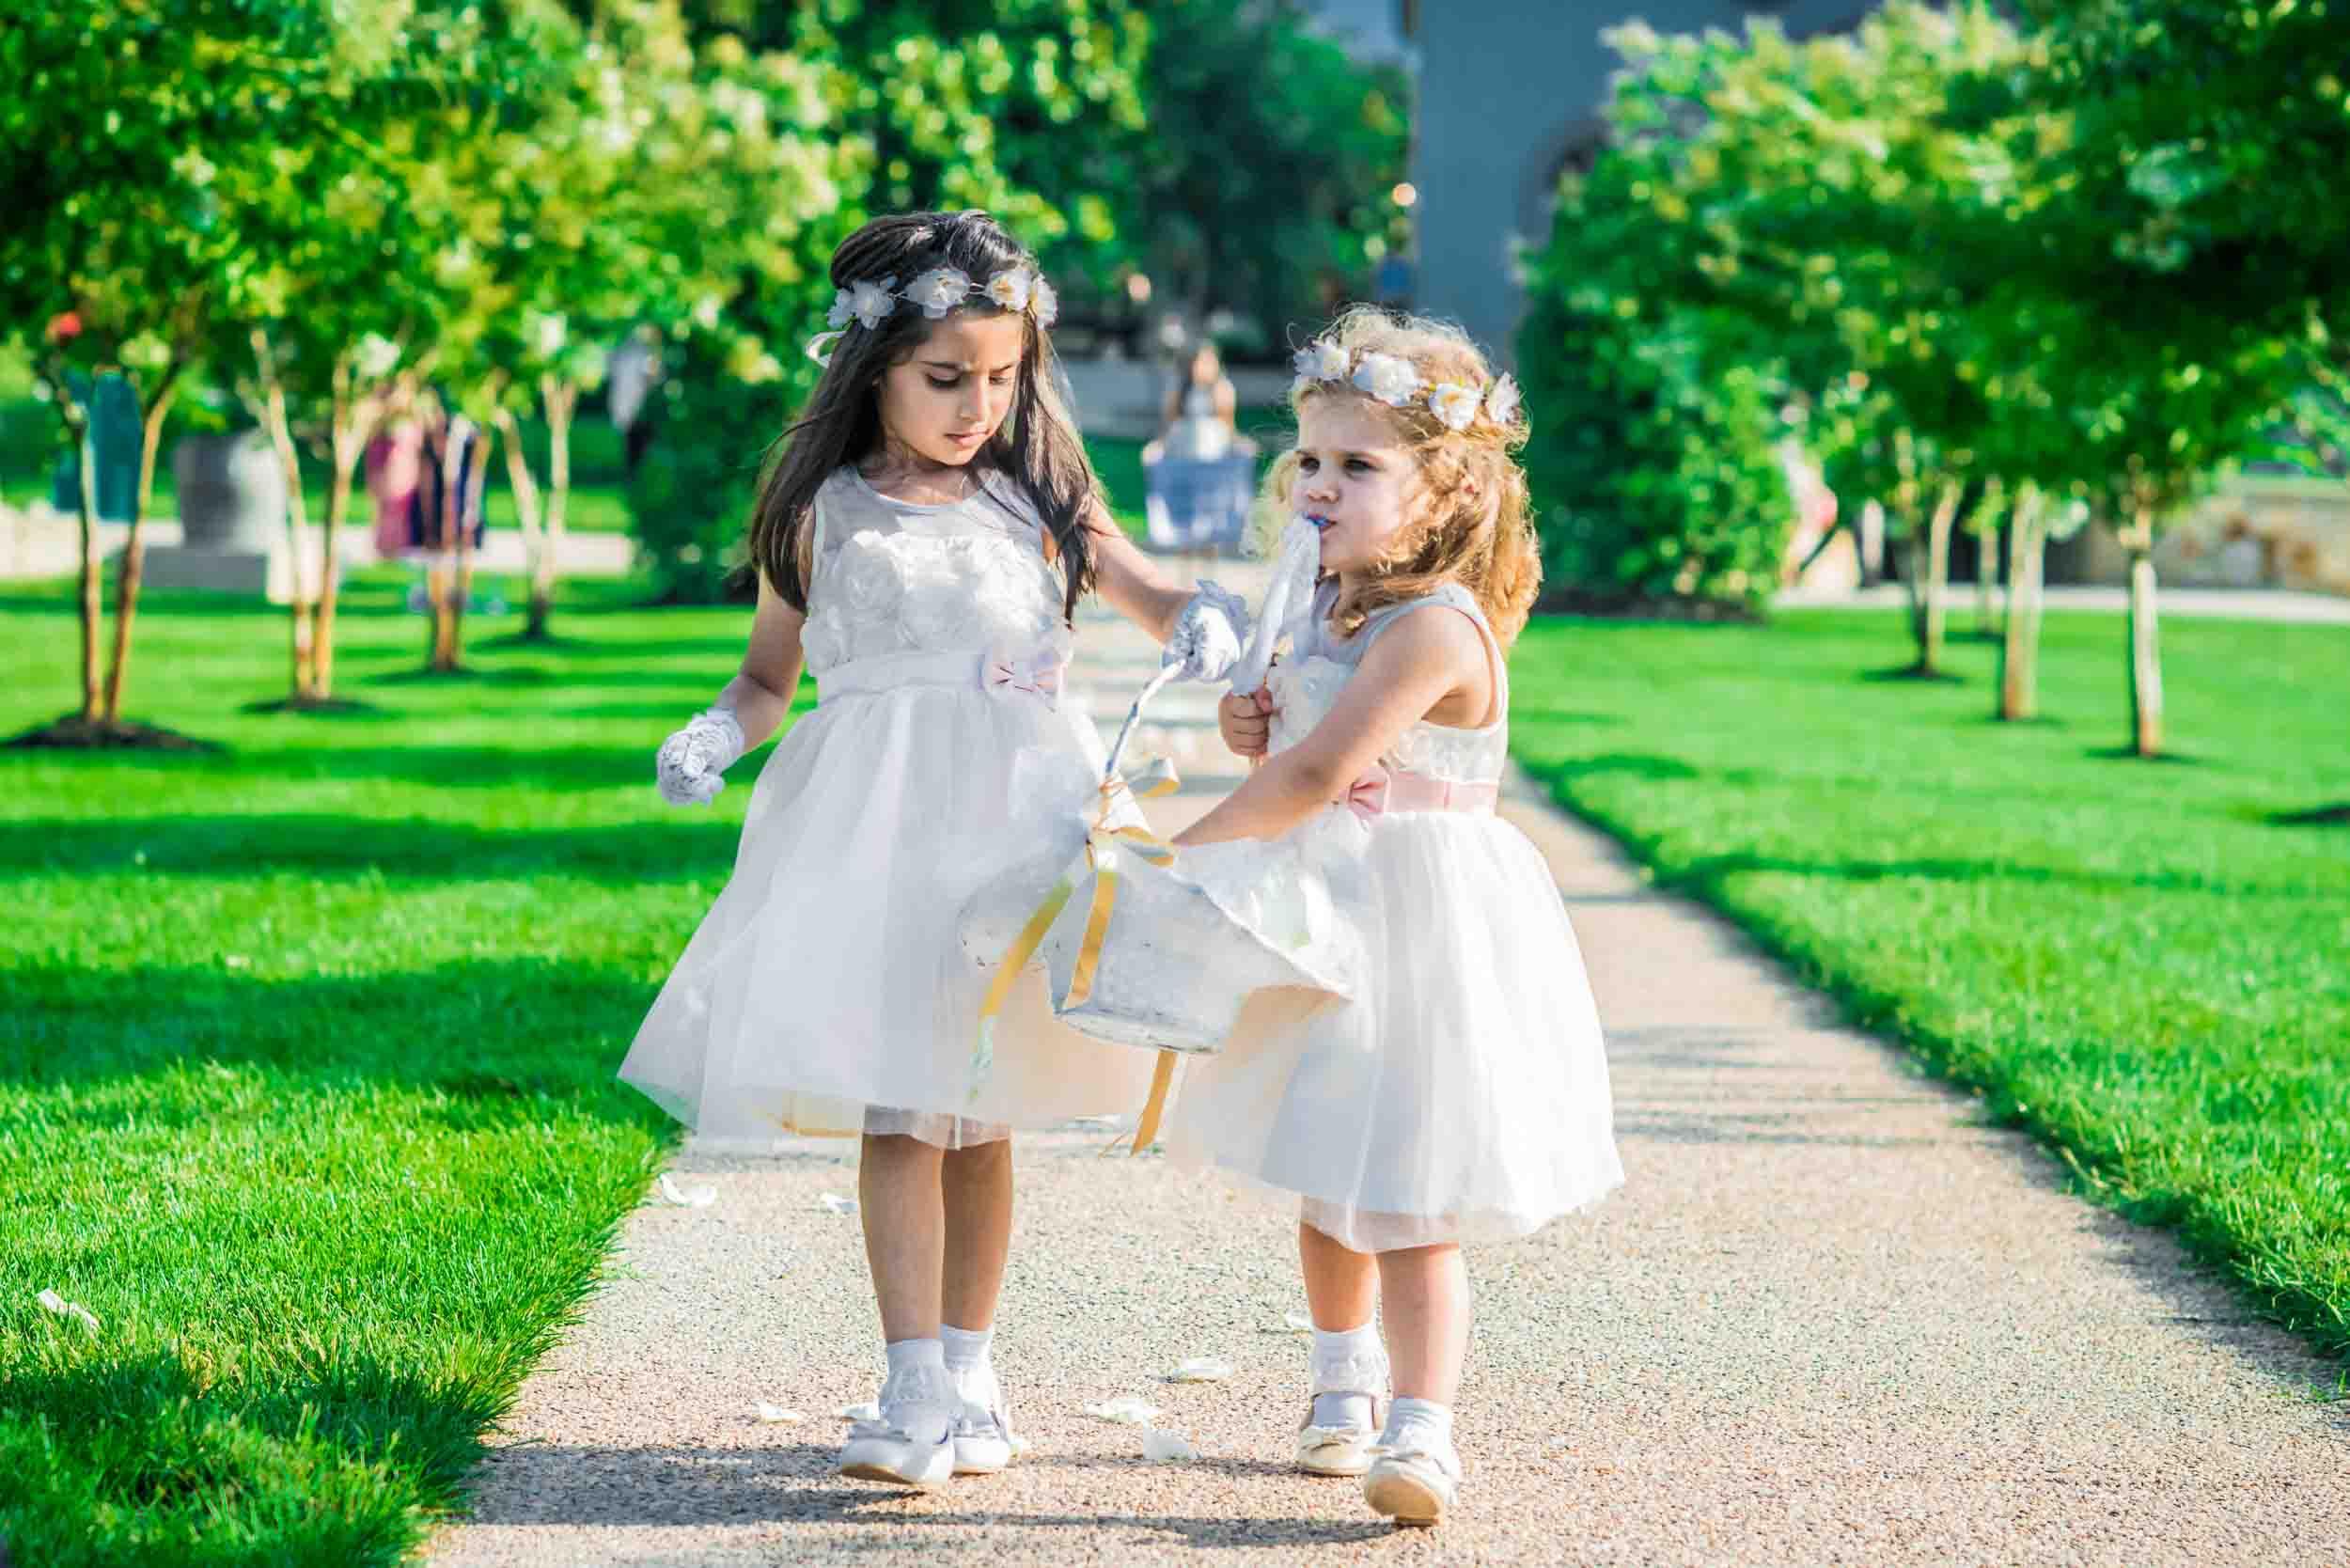 dc+metro+wedding+photographer+vadym+guliuk+photography+wedding+ceremony-2038.jpg